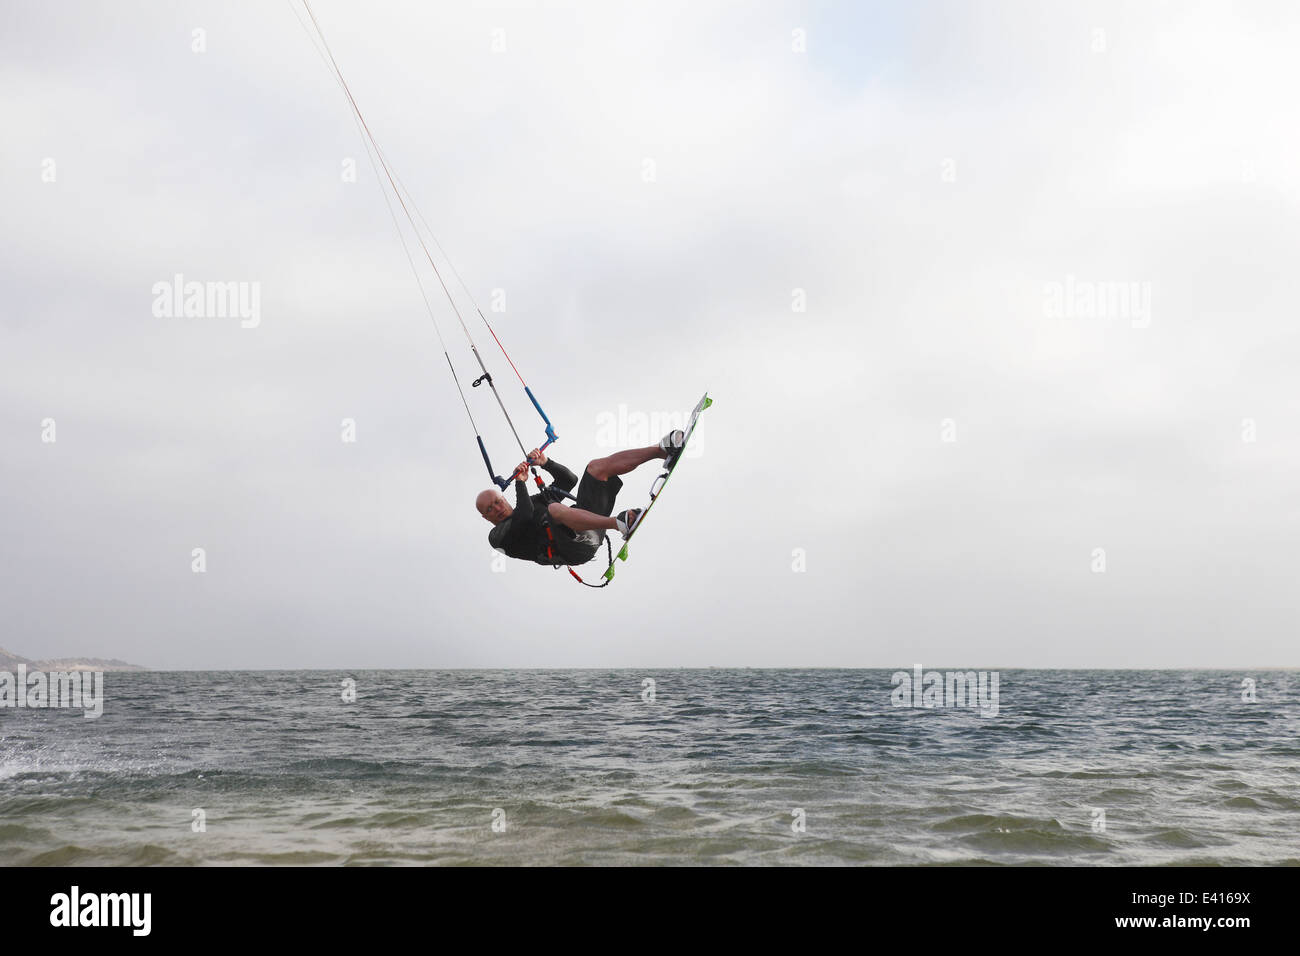 Man kitesurfing a jump on the horizon of the lagoon in Dakhla, Western Sahara, Morocco - Stock Image